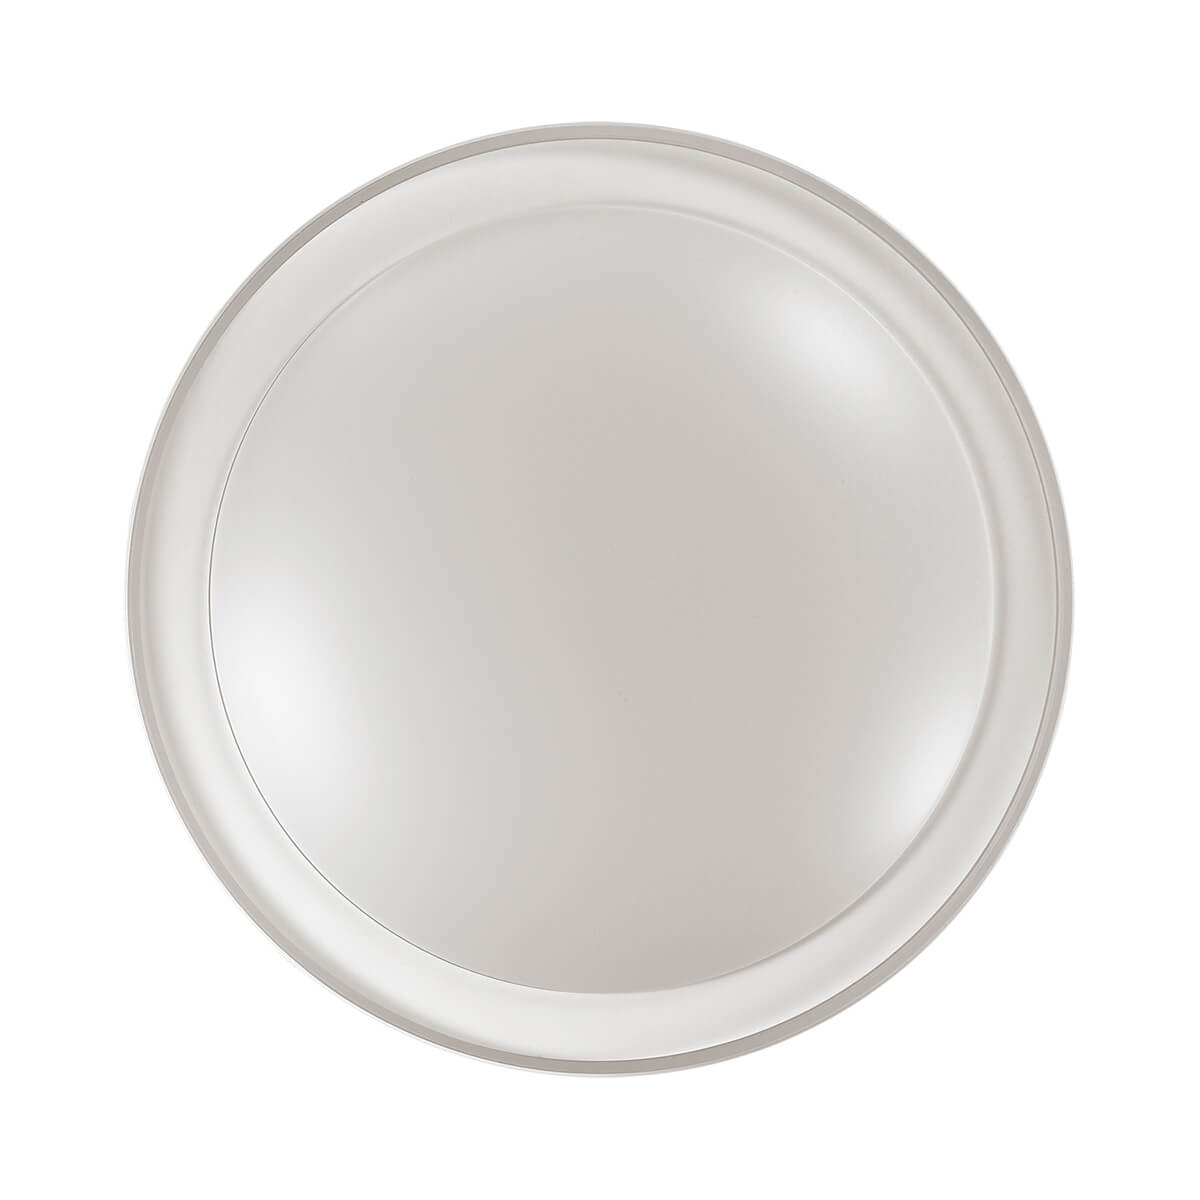 Светильник Sonex 2049/EL светильник sonex 2049 el